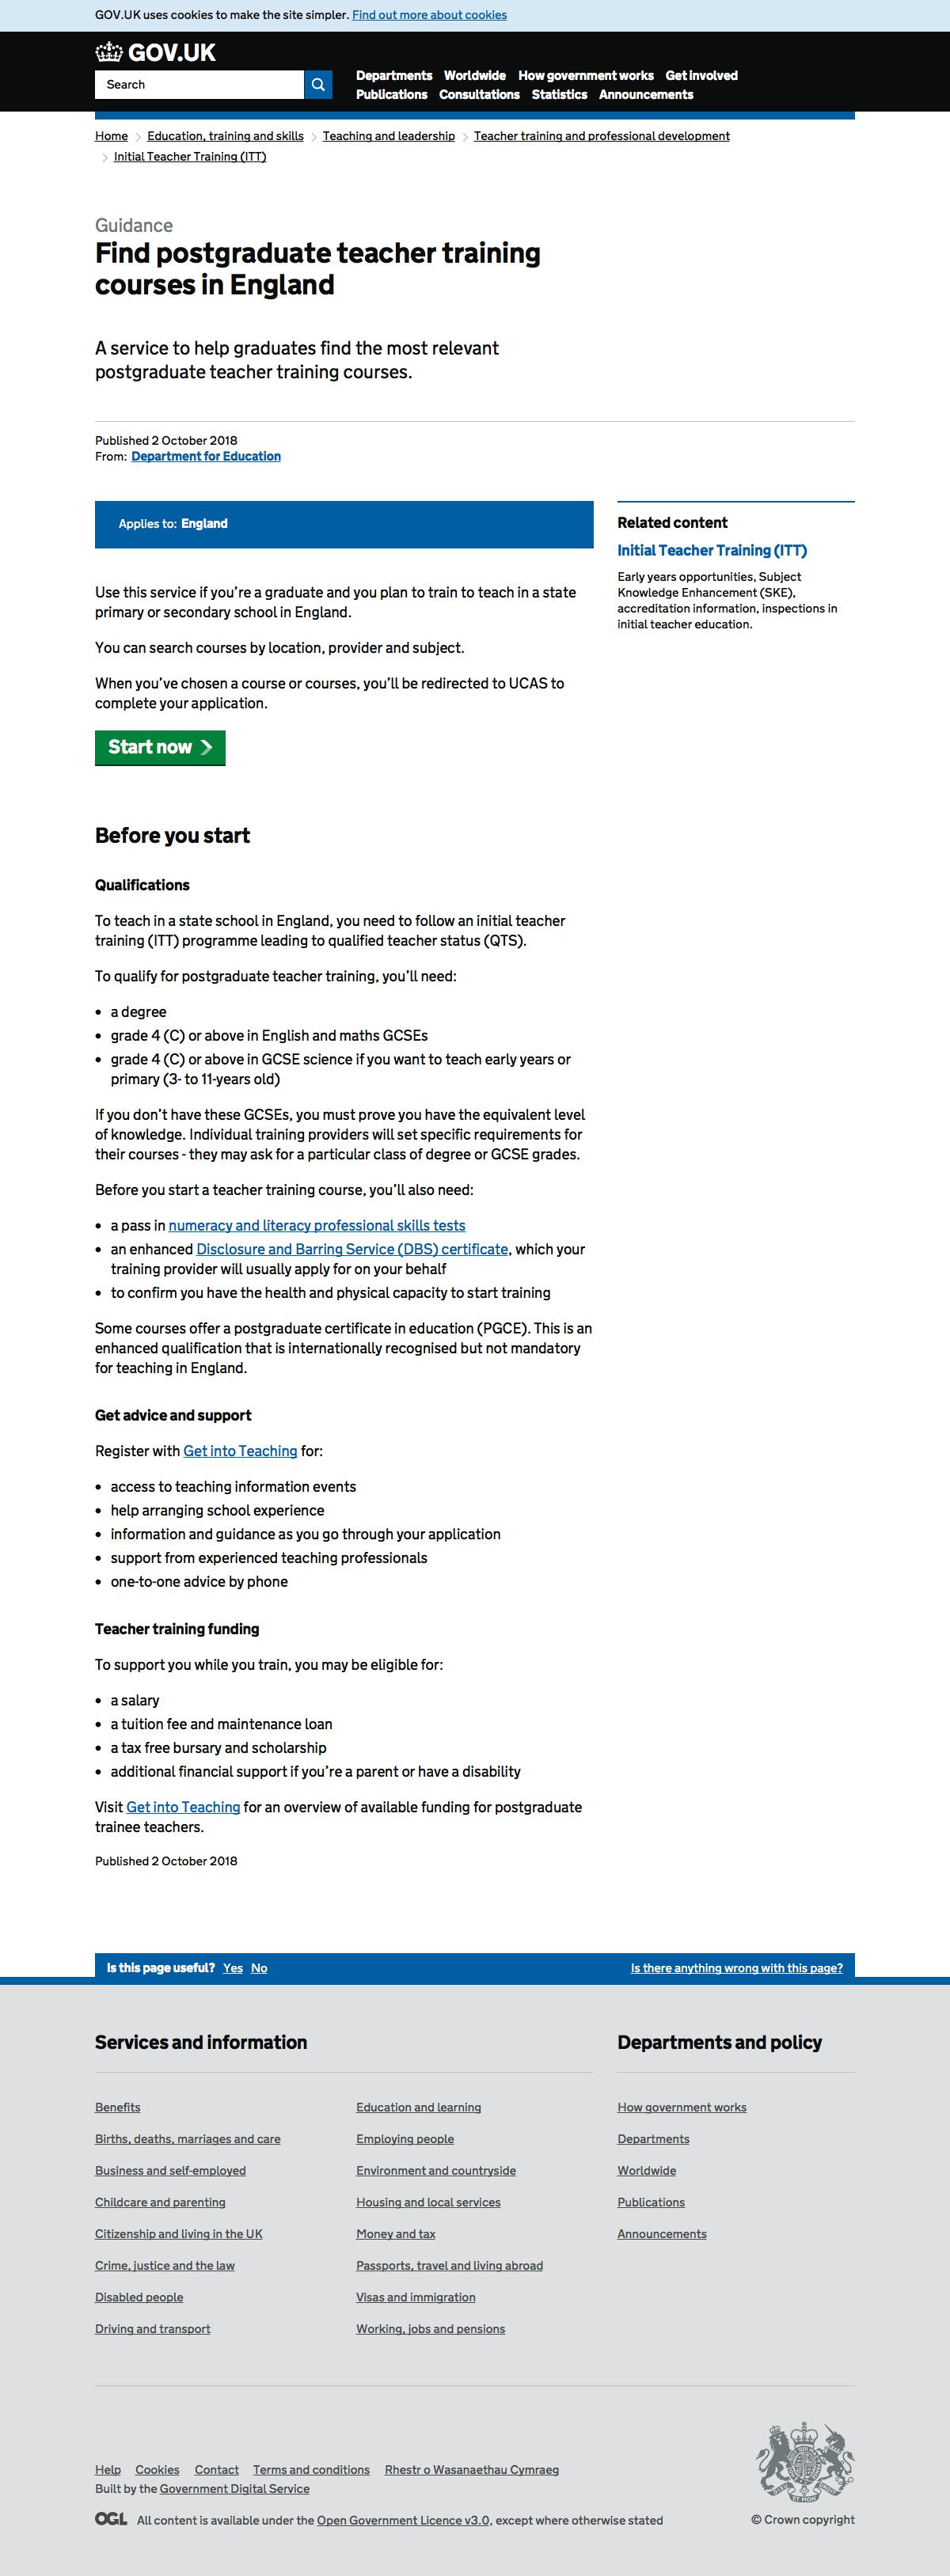 Screenshot of GOV.UK start page